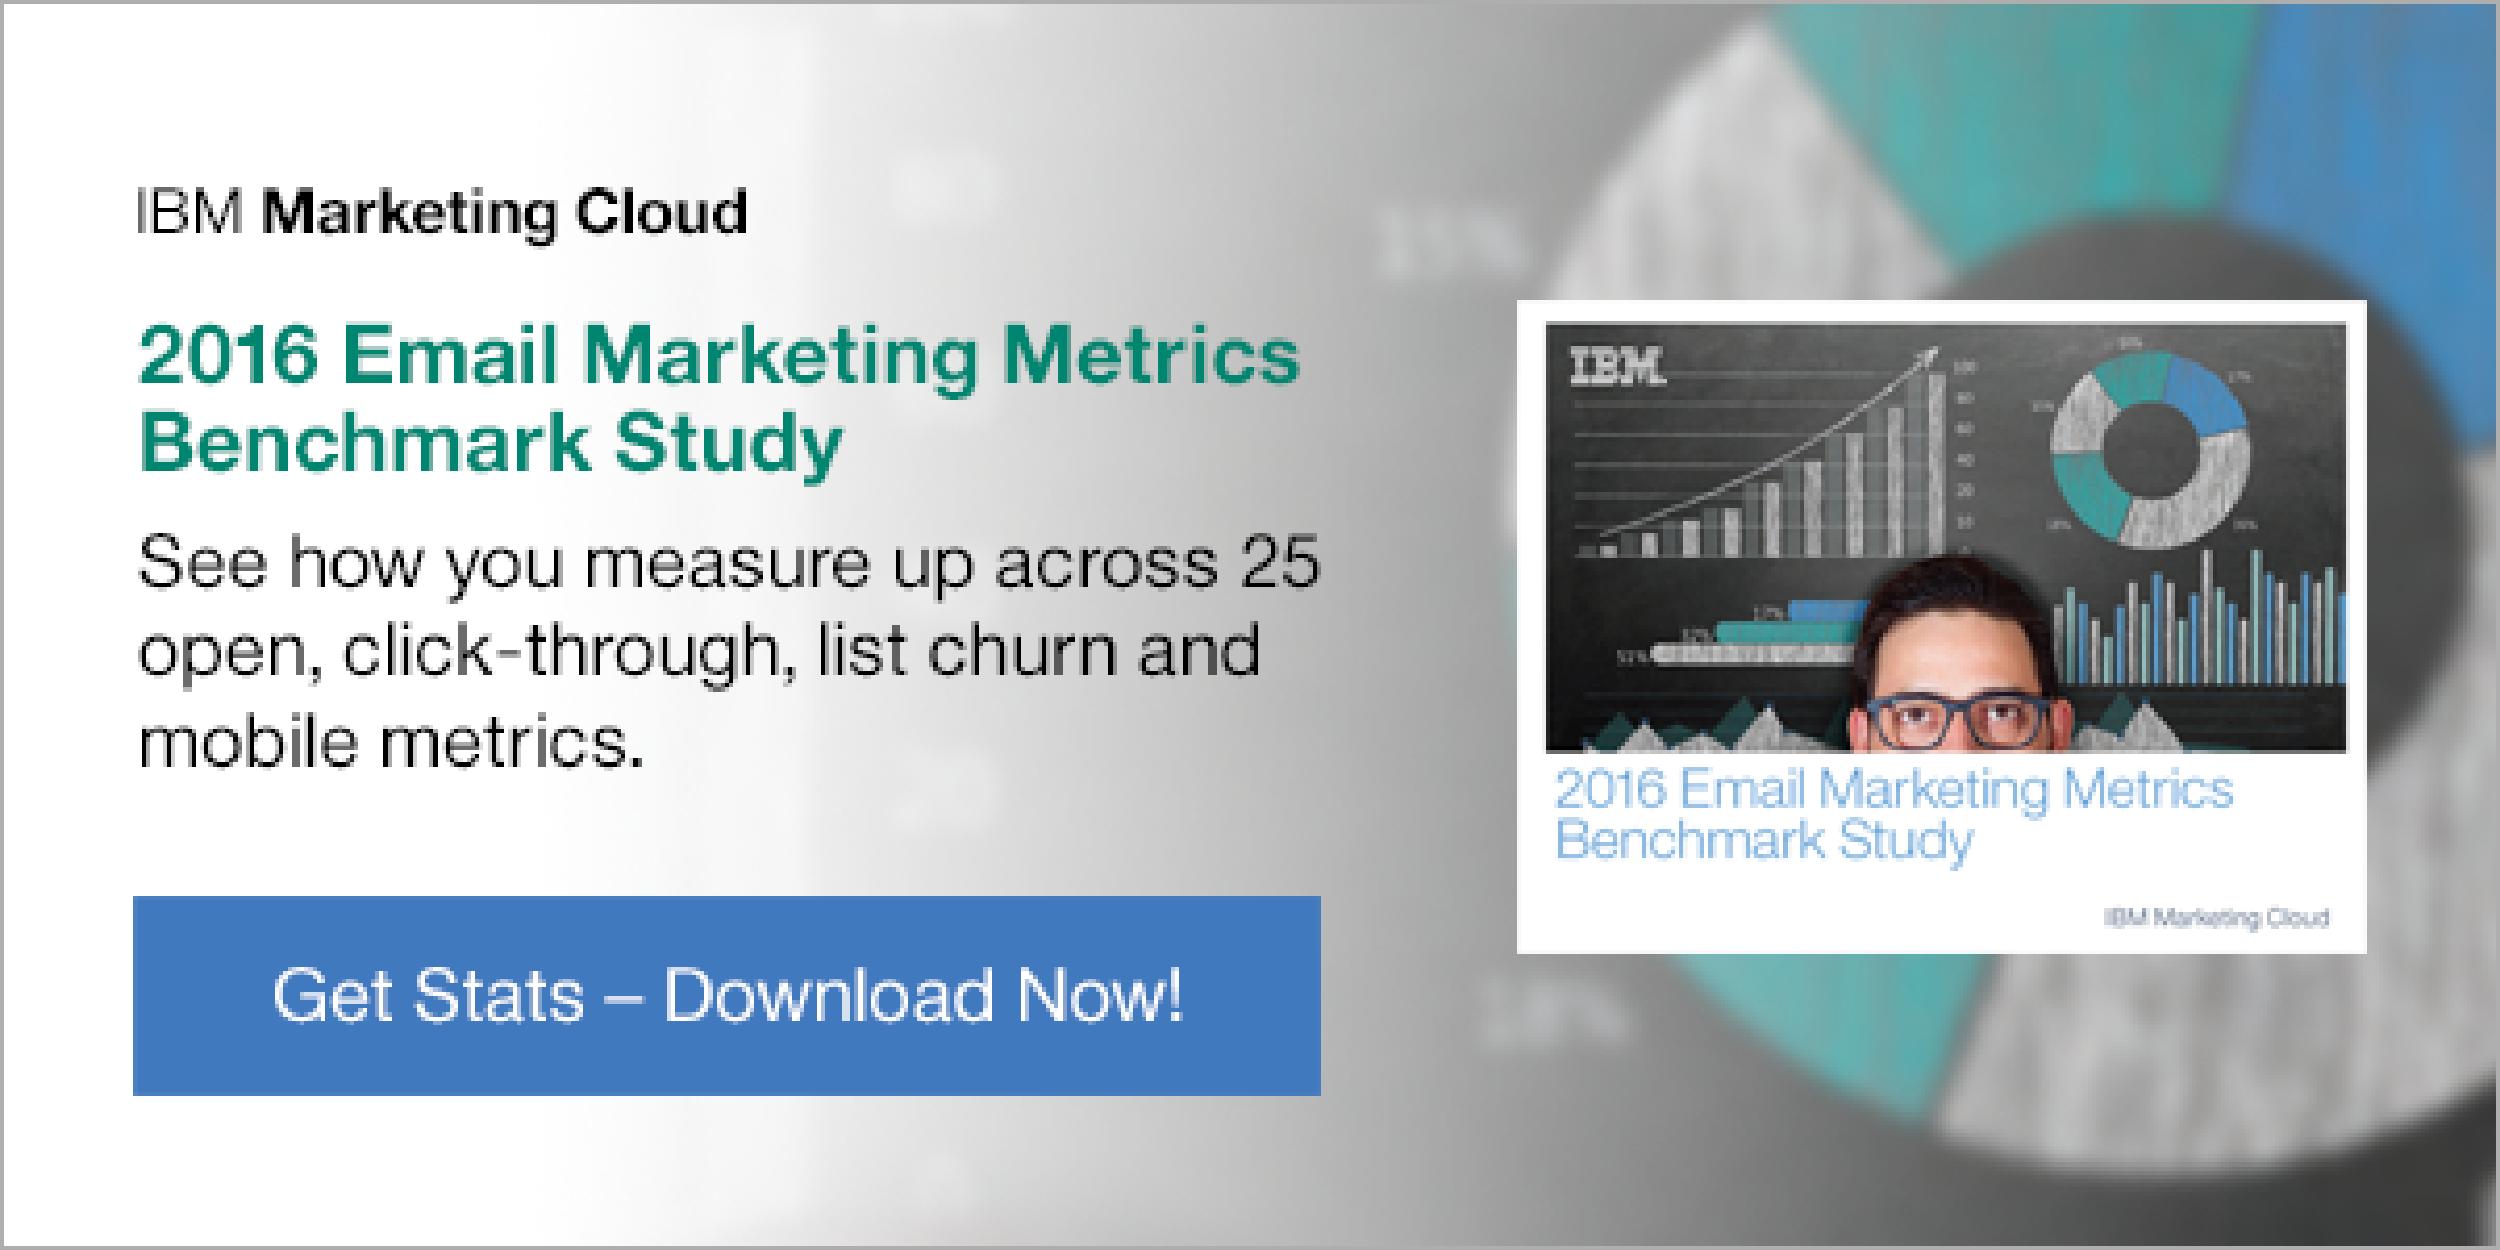 ibmmc-2016-email-benchmark-600x300